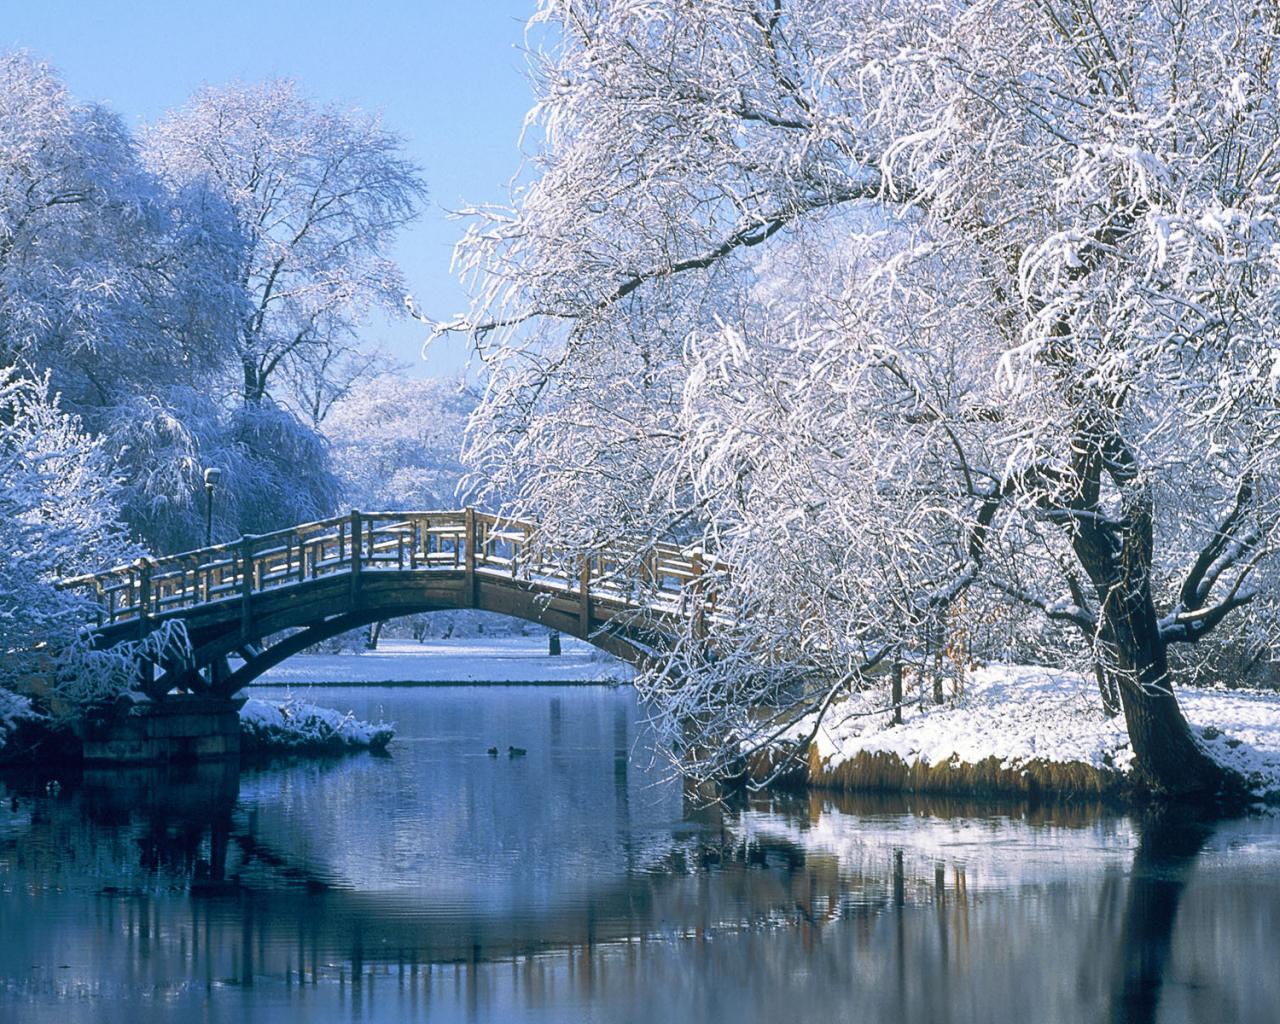 Фото на рабочий зима